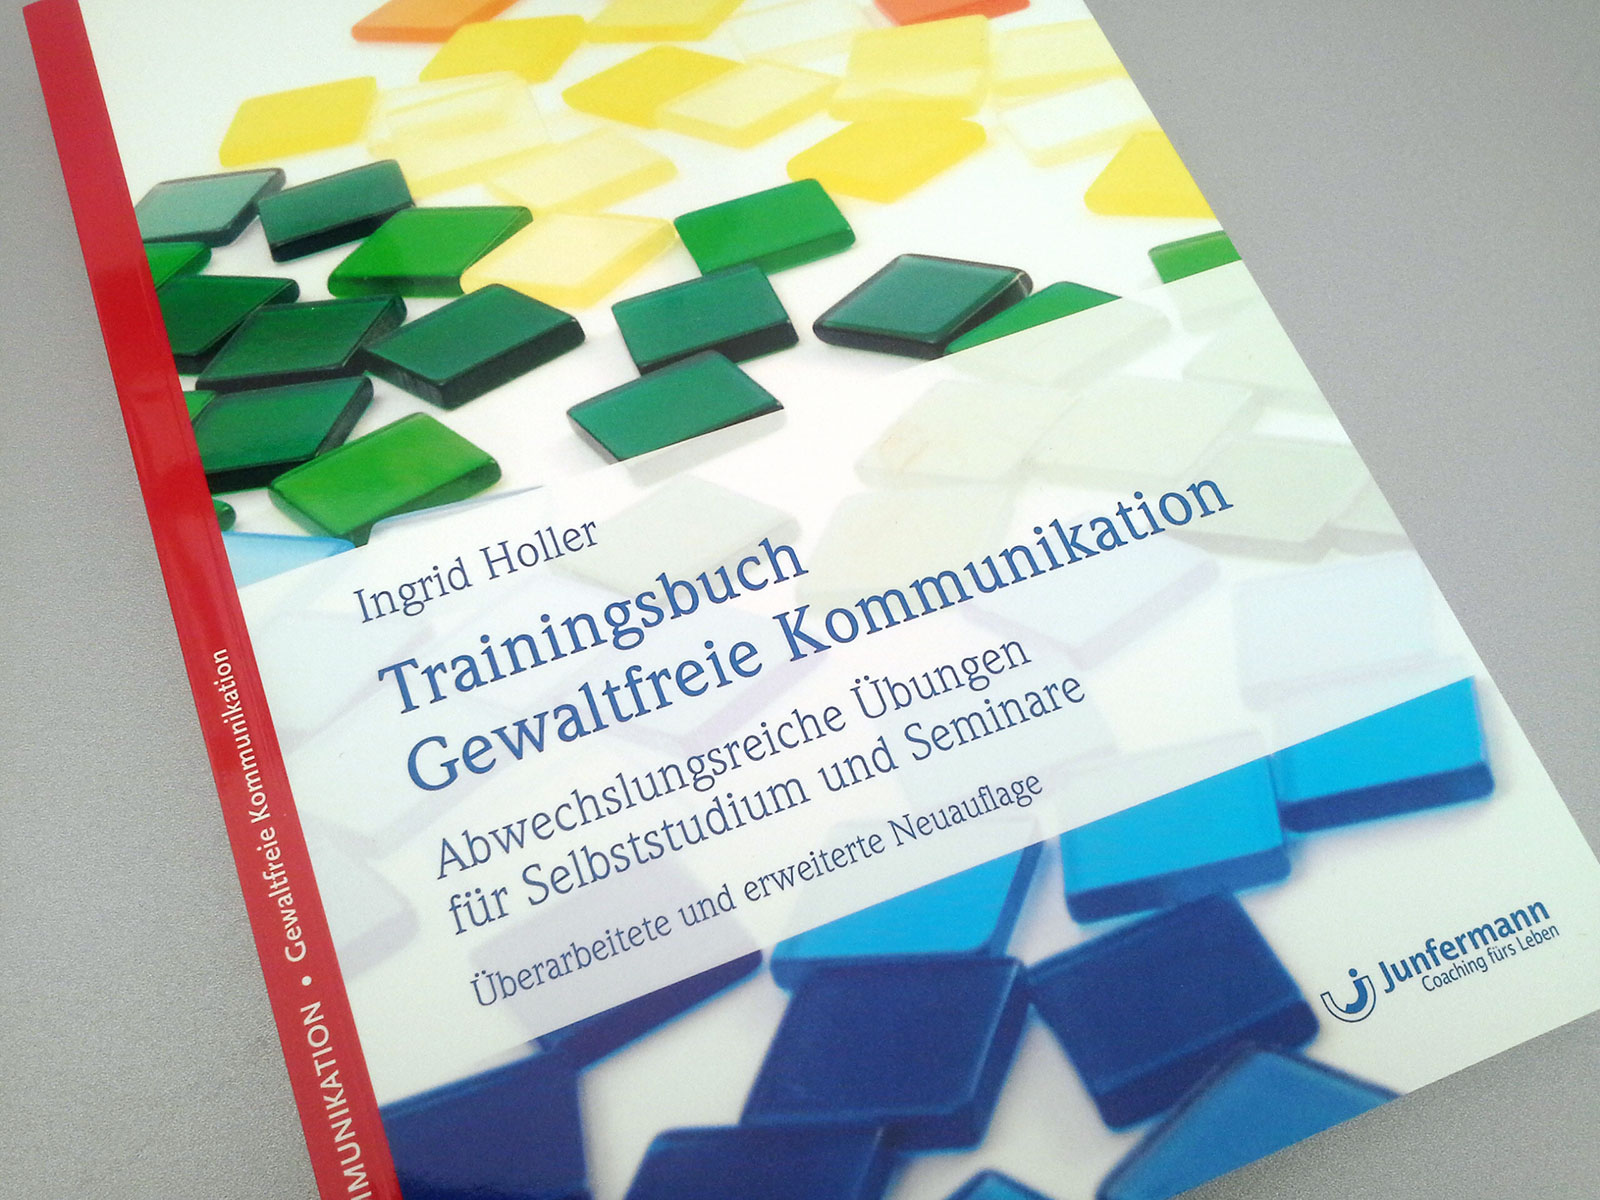 trainingsbuch-gewaltfreie-kommunikation